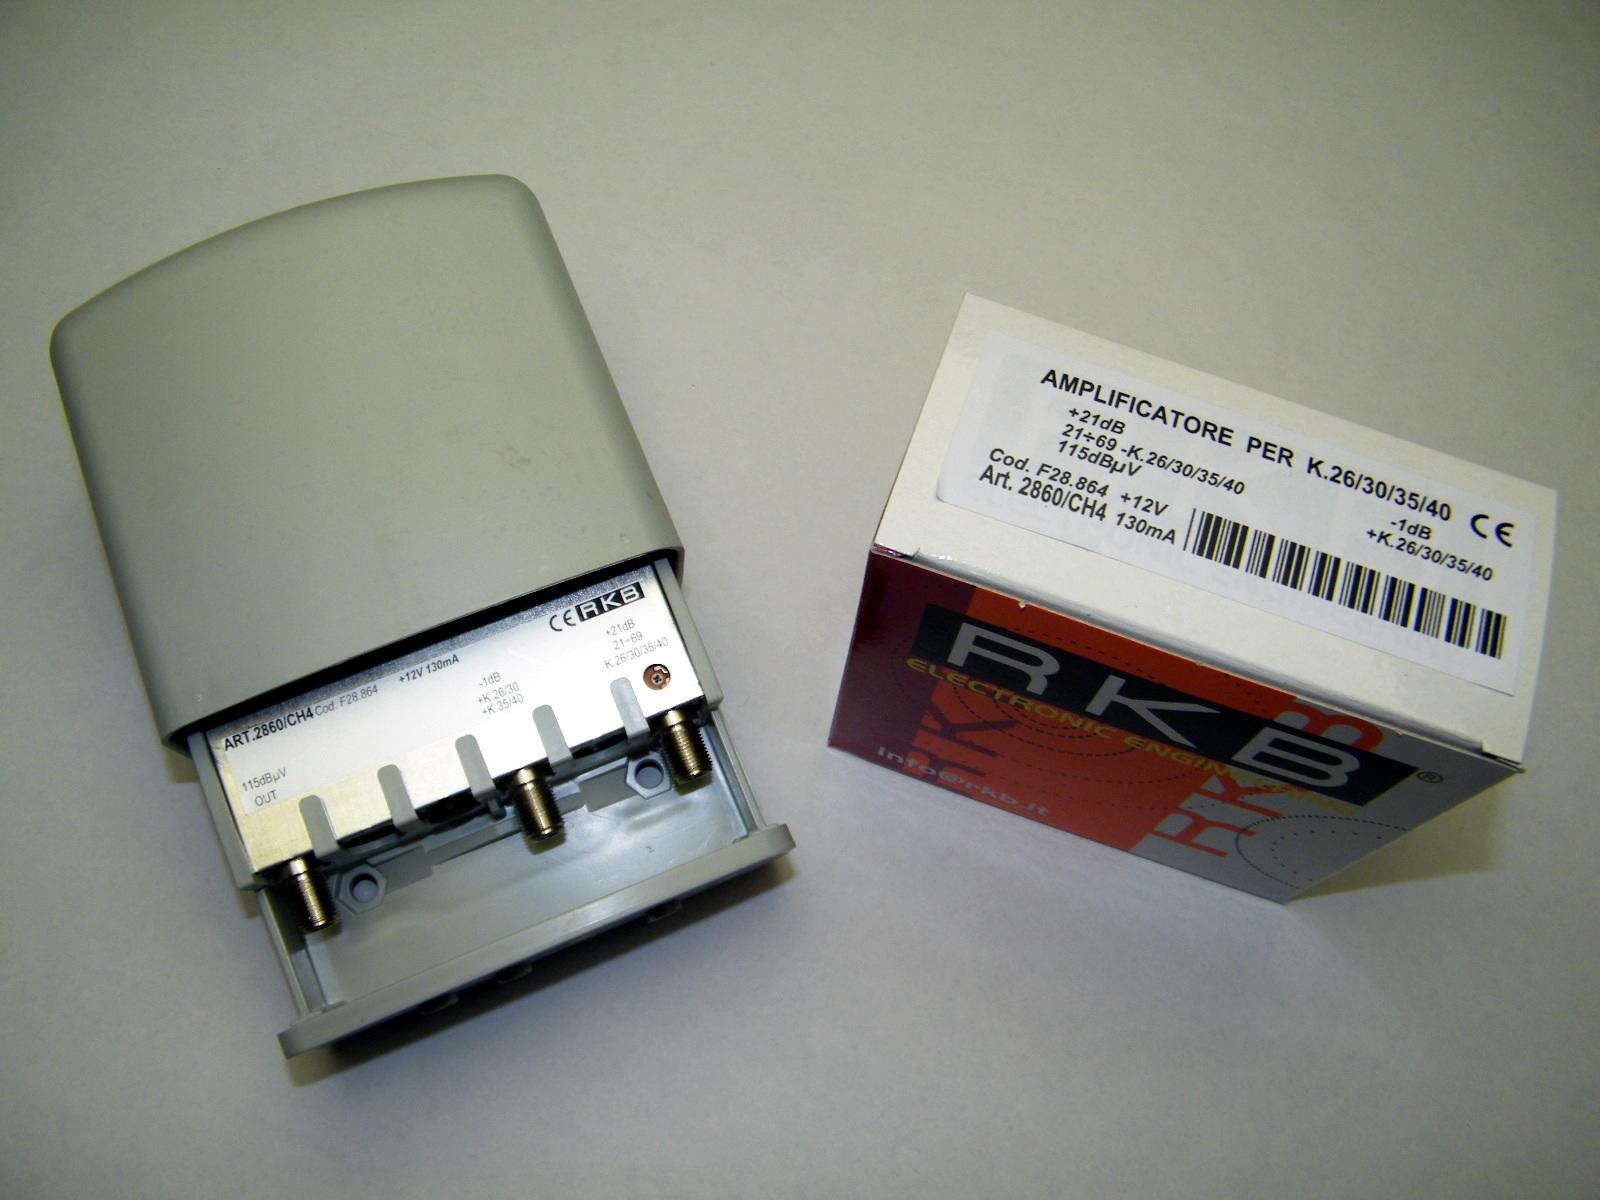 Amplificatore x 4 Mux Rai 26,30,35,40 21dB UHF-K/K -1dB 115dBuV 130mA 2860CH4